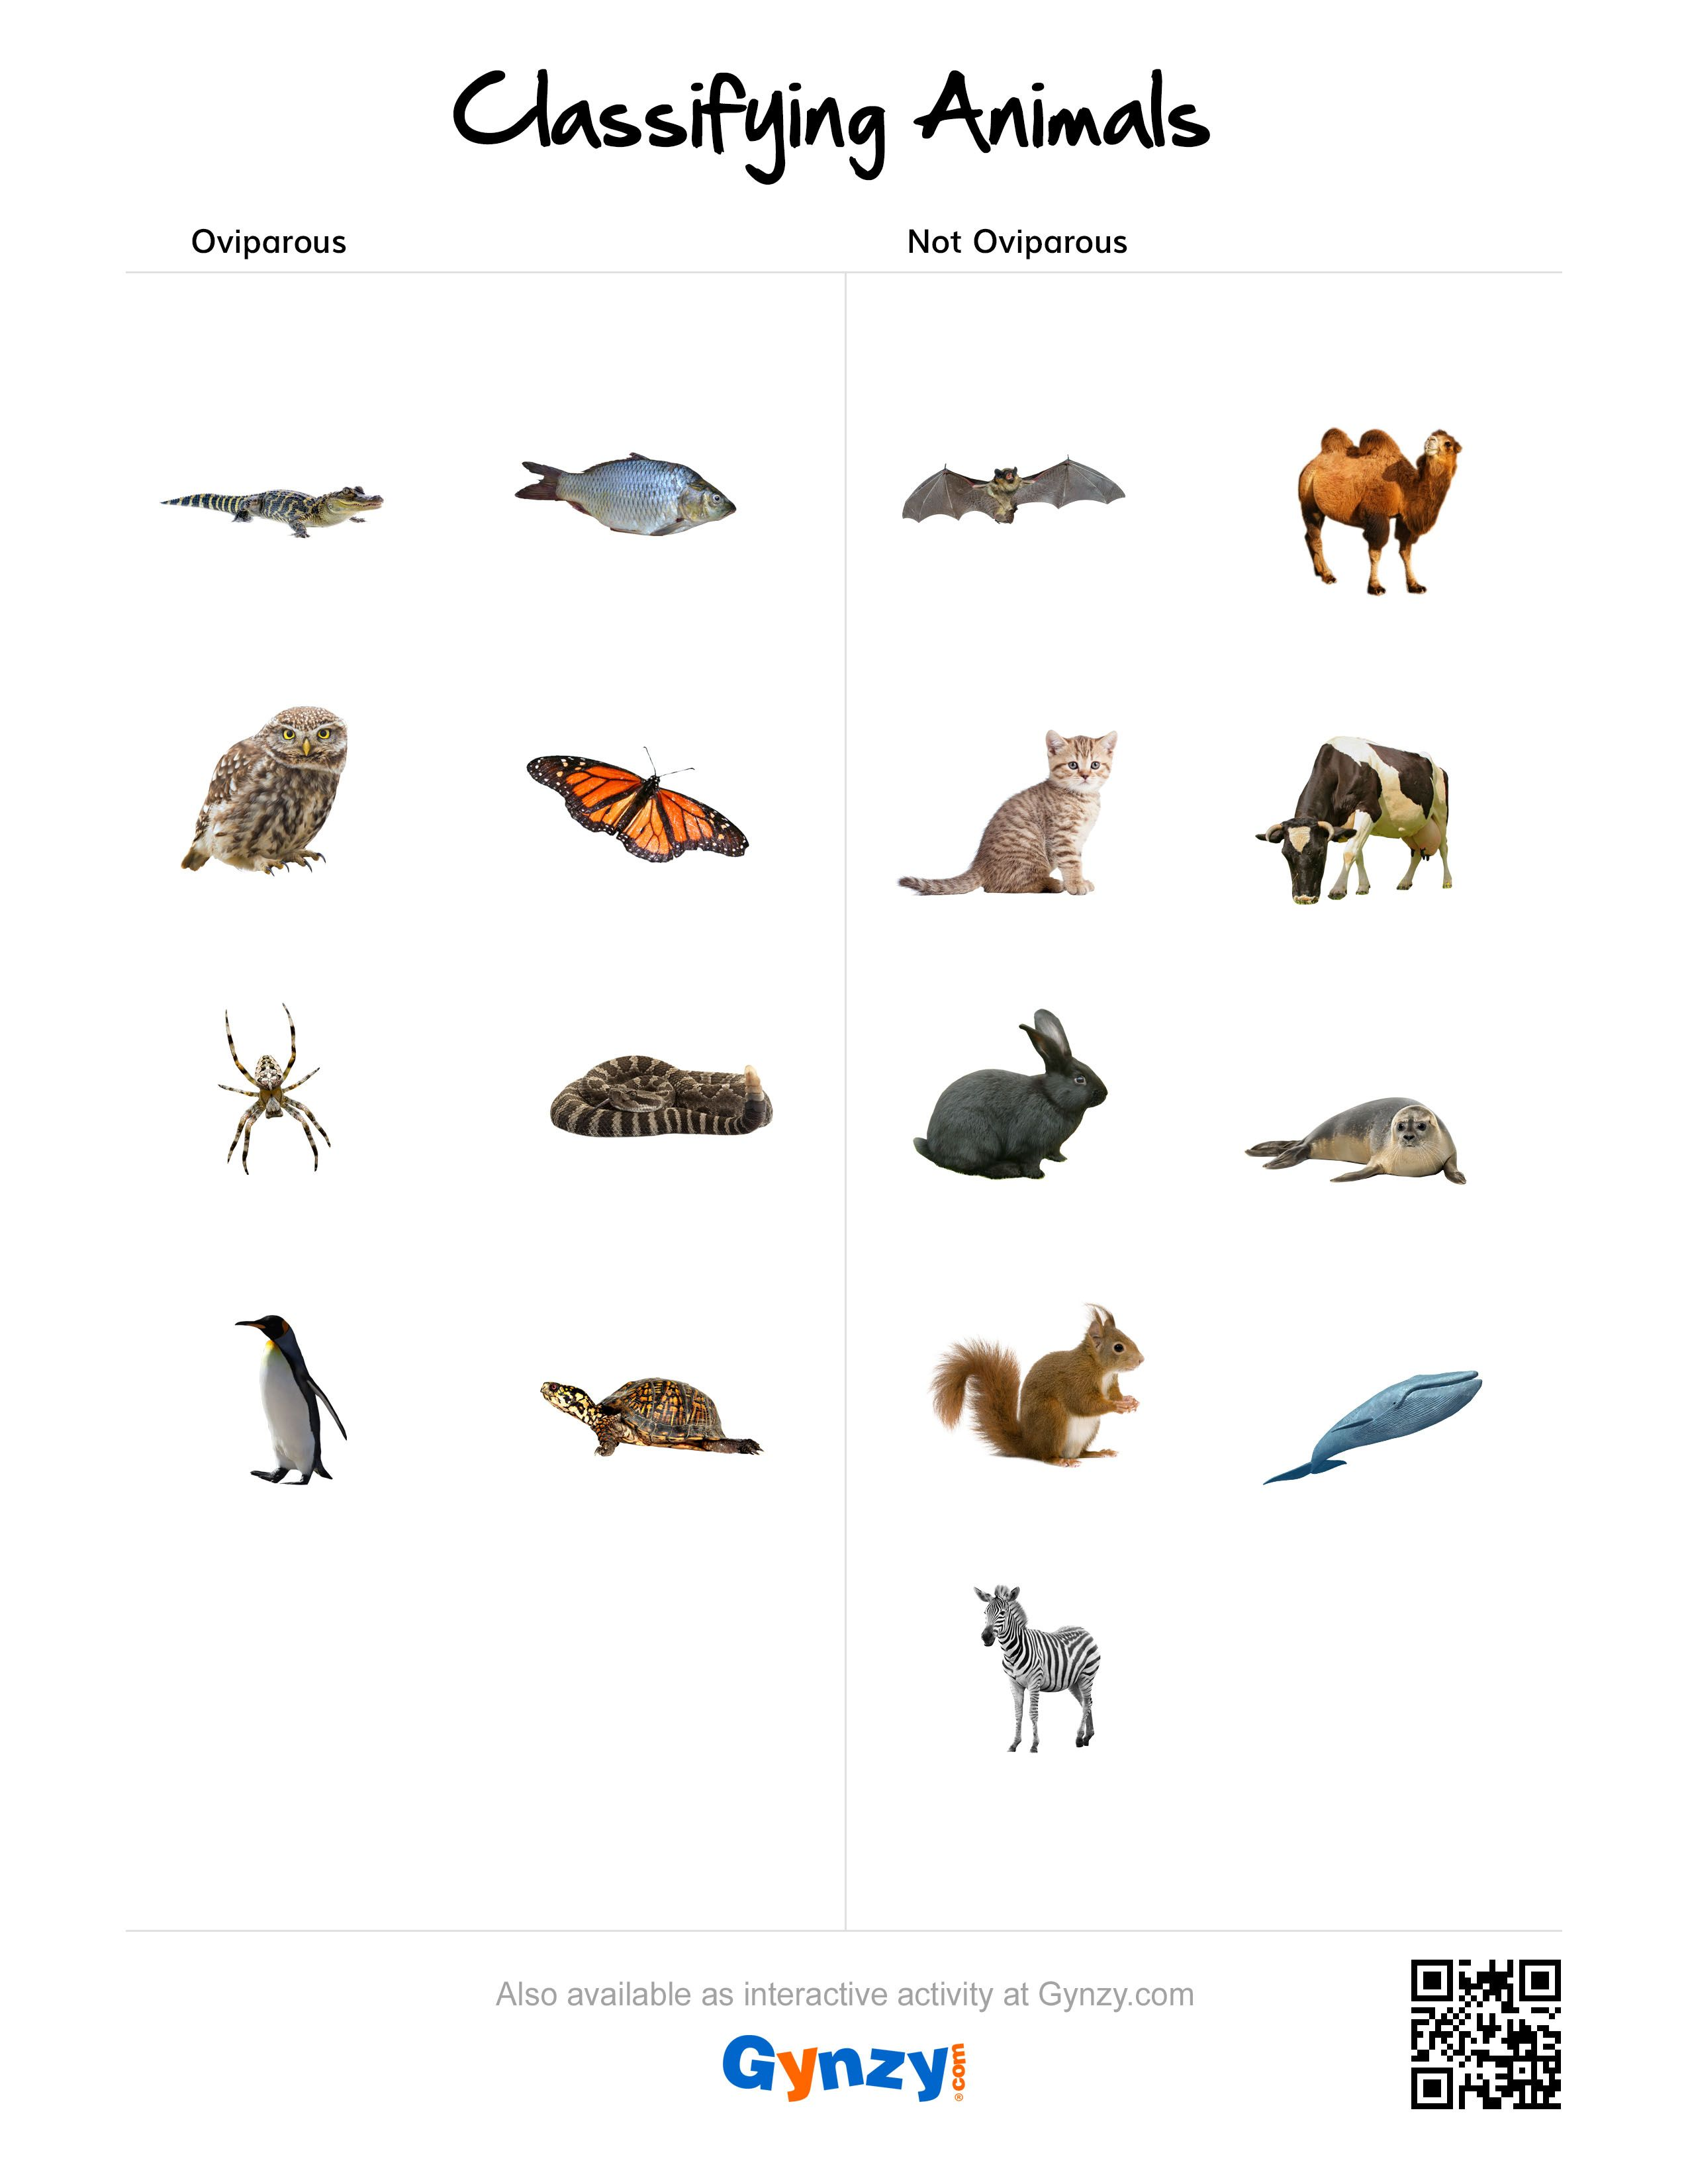 worksheet Classifying Animals Worksheet oviparous or not httpsr gynzy com285e12fa com classifying animalsanimal classificationinteractive whiteboardsmart boardsworksheets